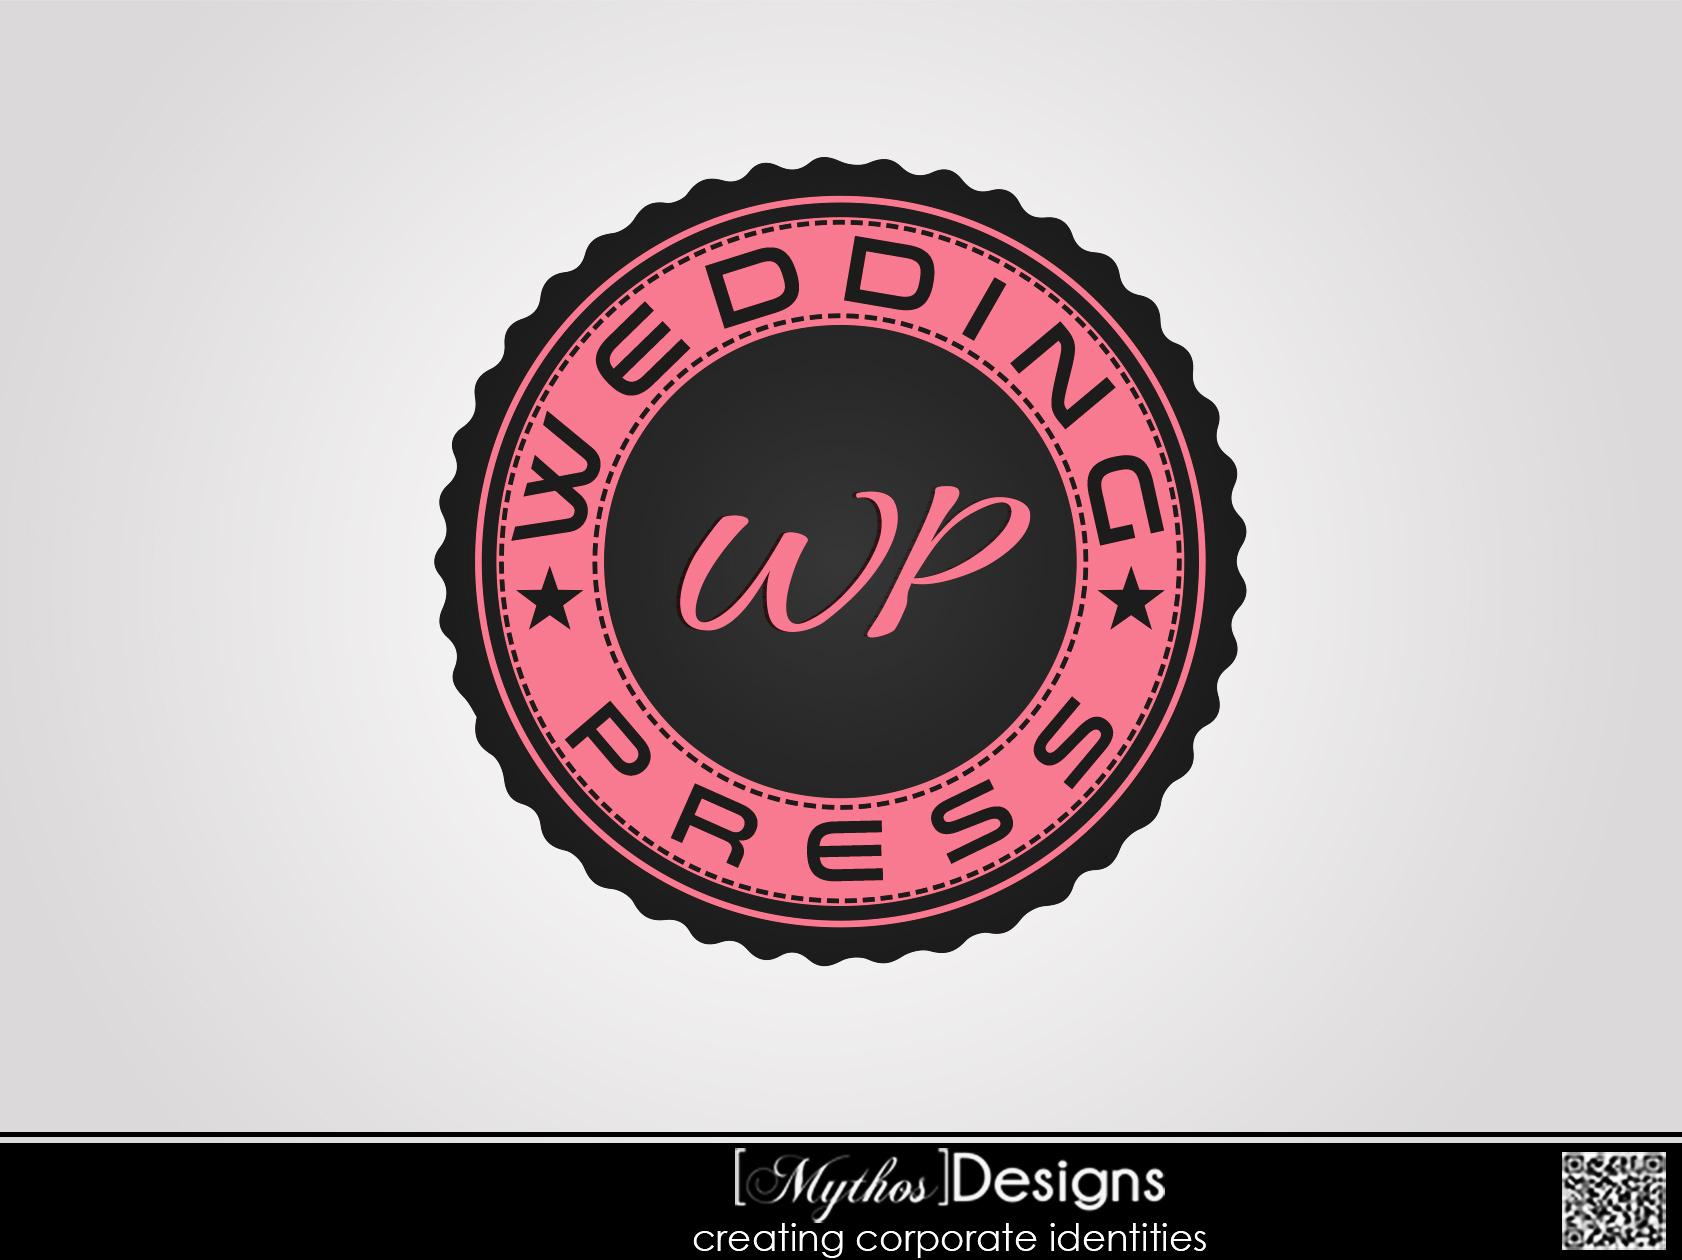 Logo Design by Mythos Designs - Entry No. 18 in the Logo Design Contest Wedding Writes Logo Design.